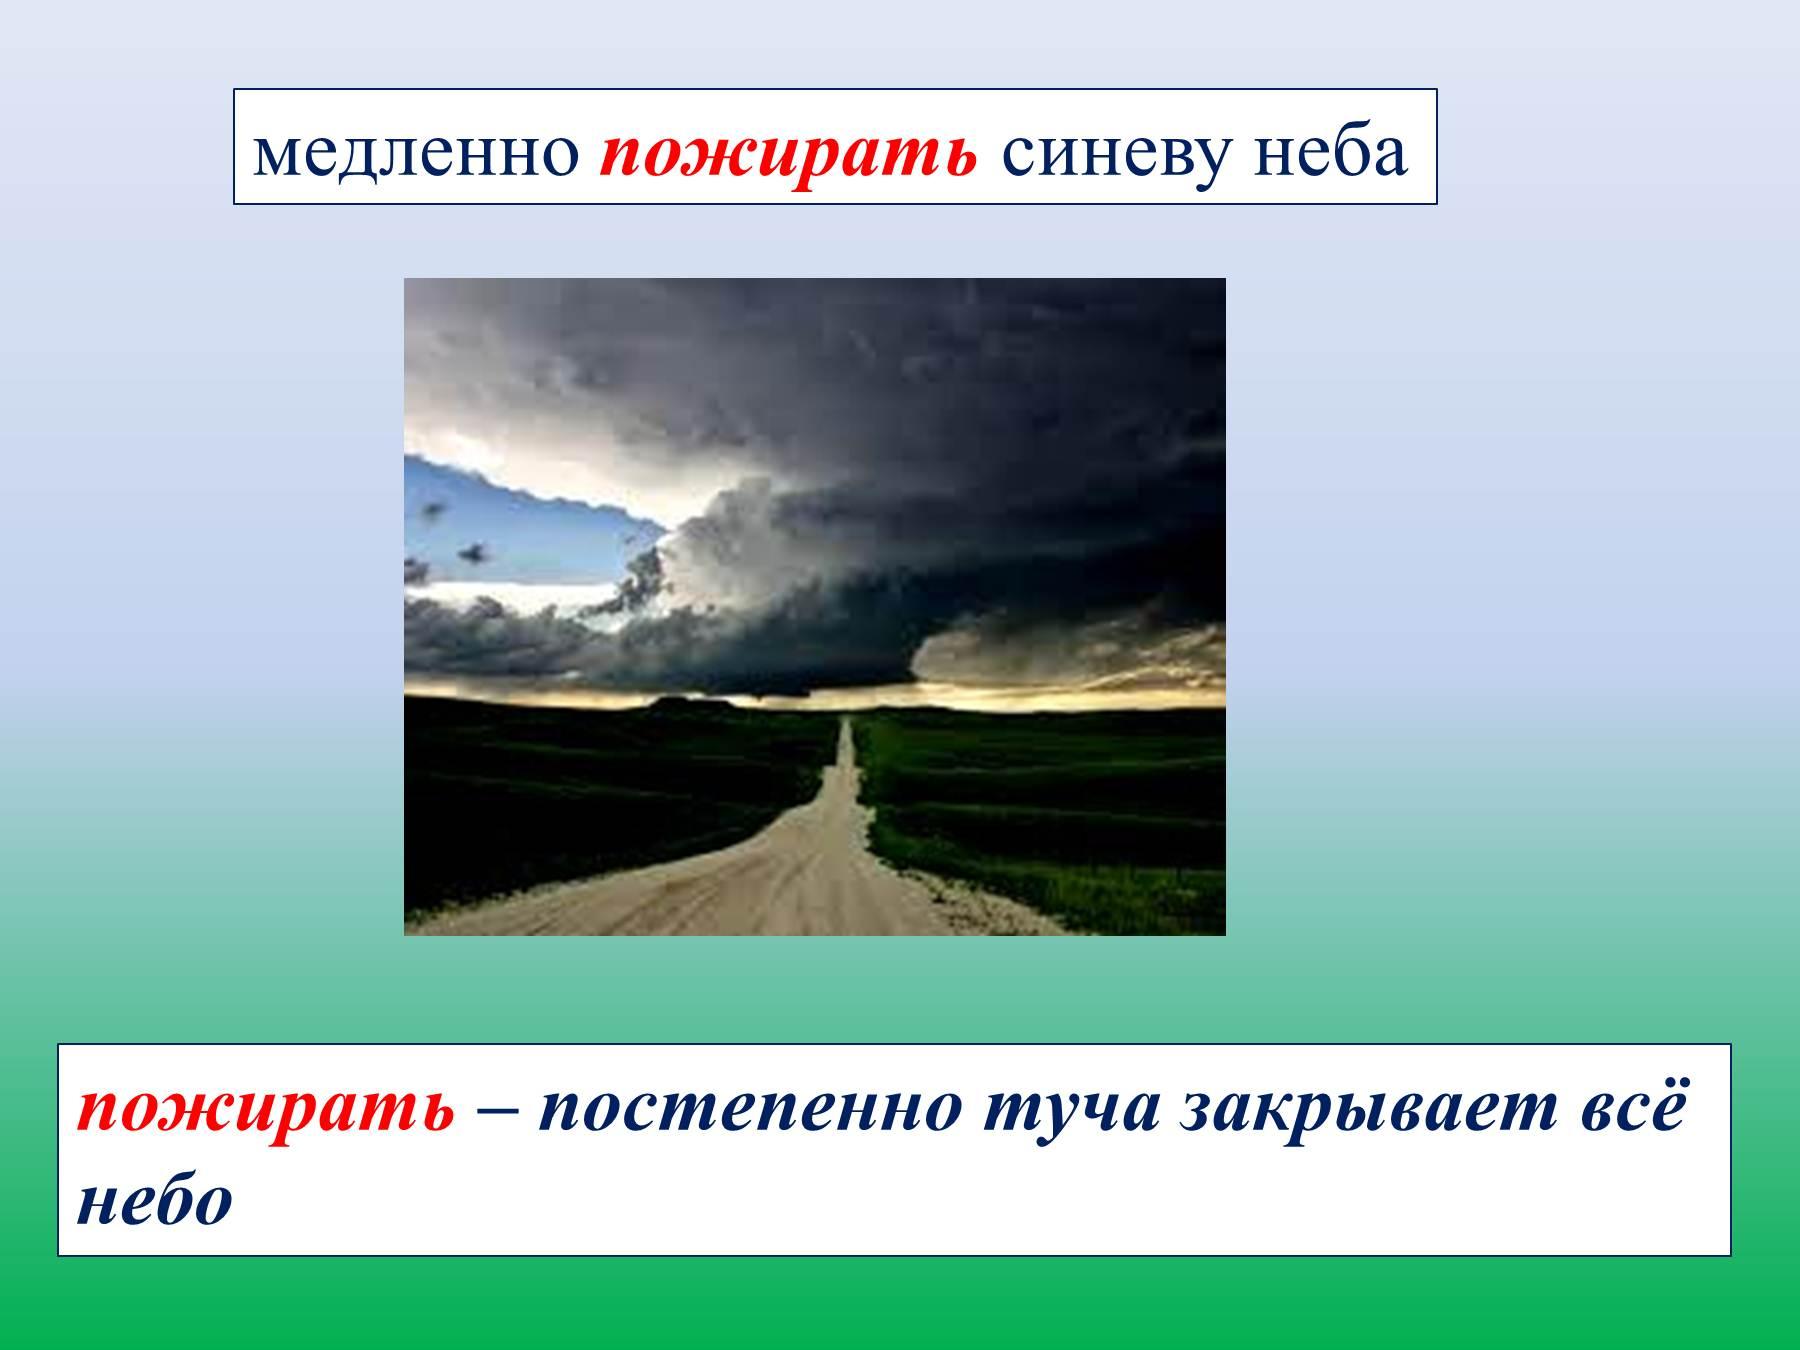 Galleryru / фото #6 - р 2018р0b5р- р405р р0b7р406р р405рёс40f - rya-olga